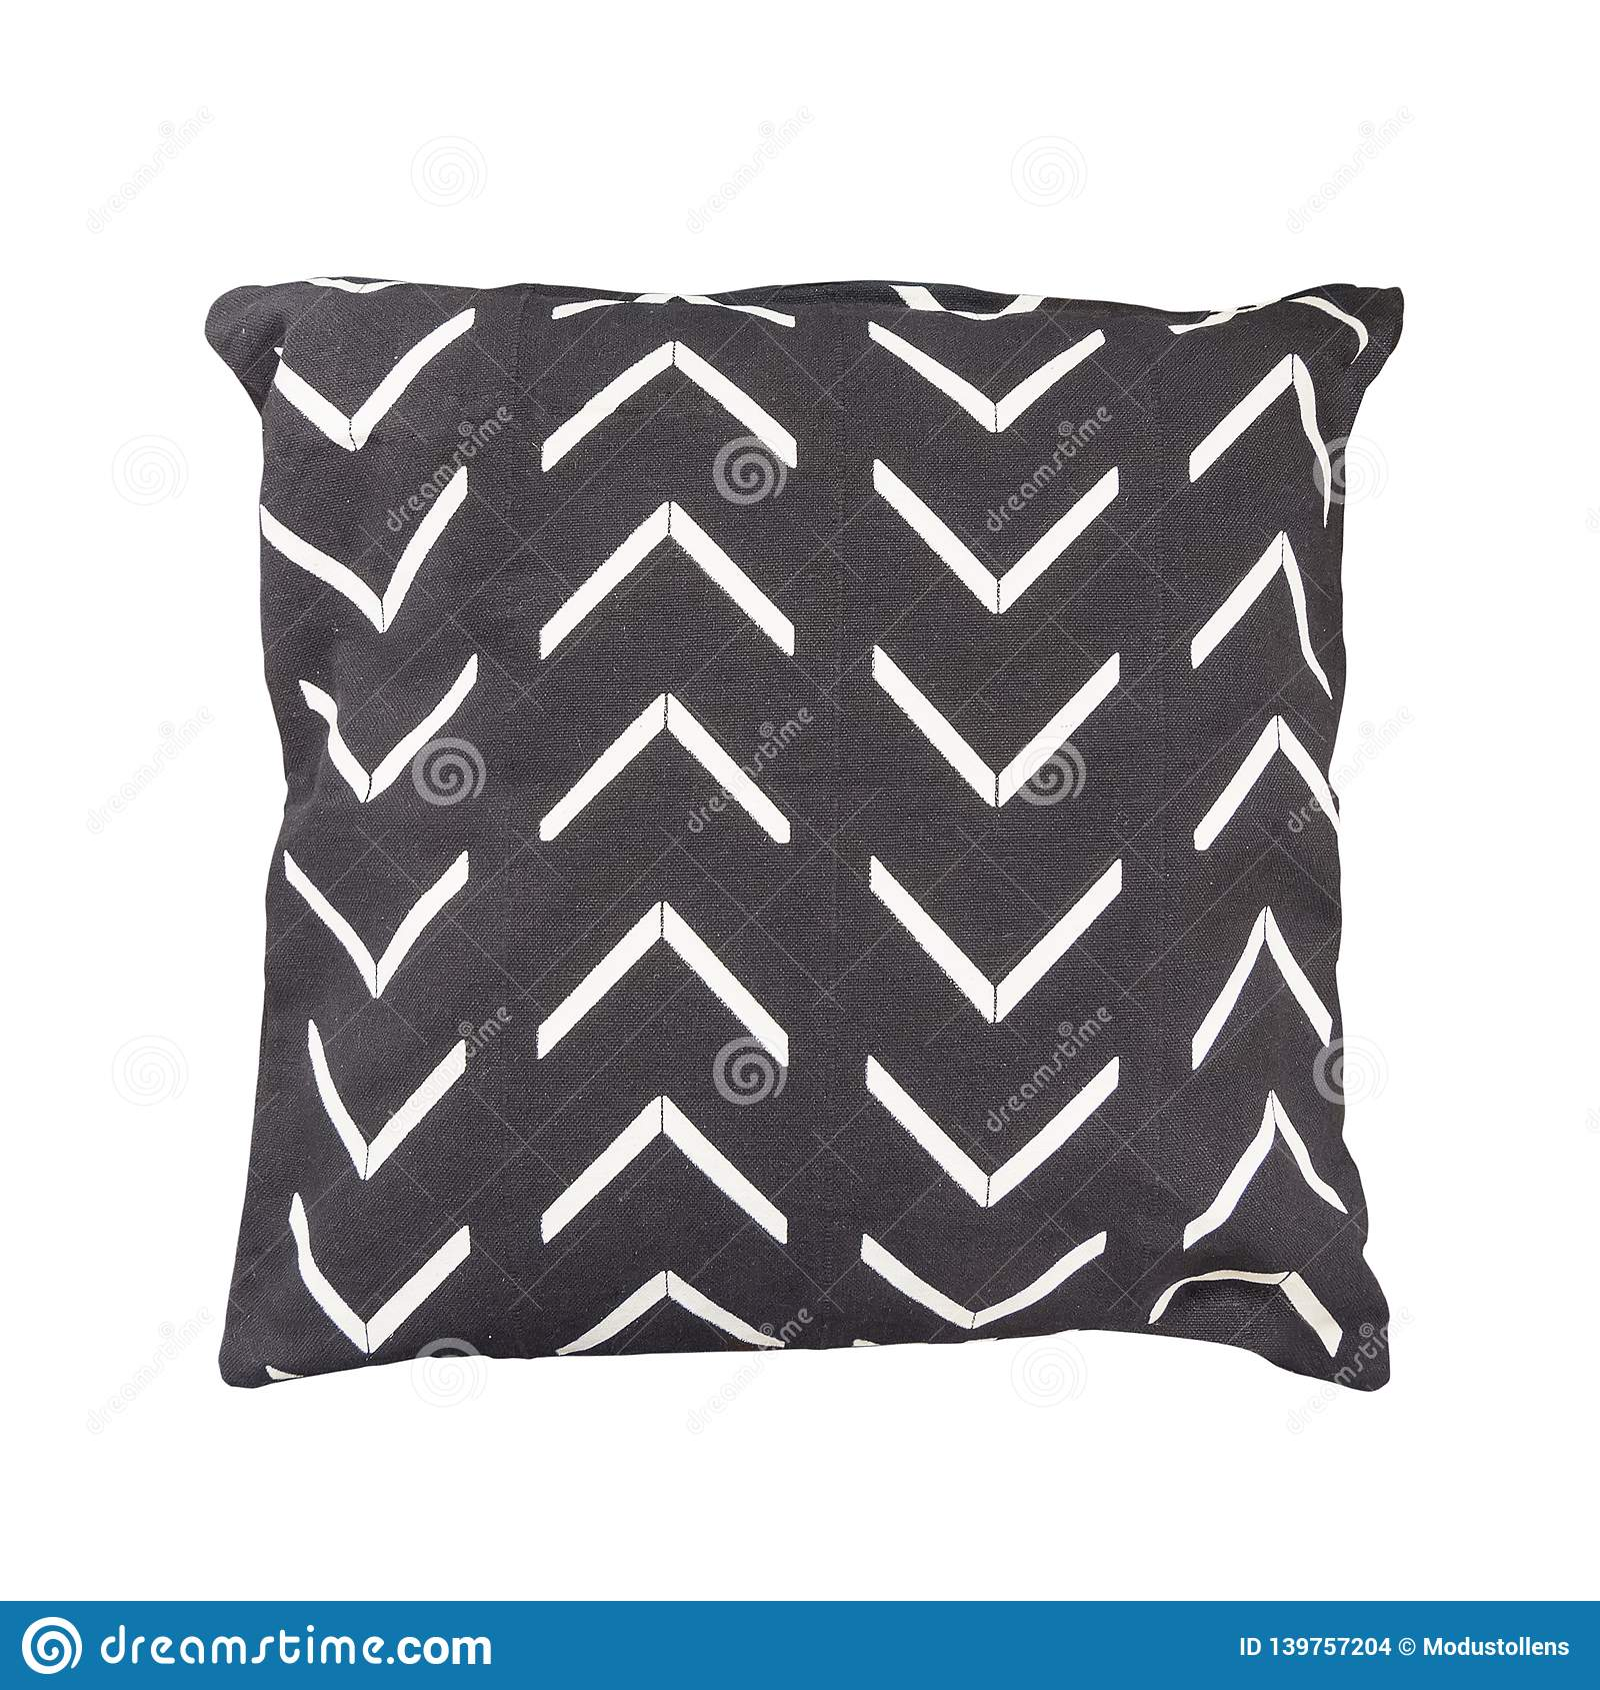 Decorative cushion with geometric pattern